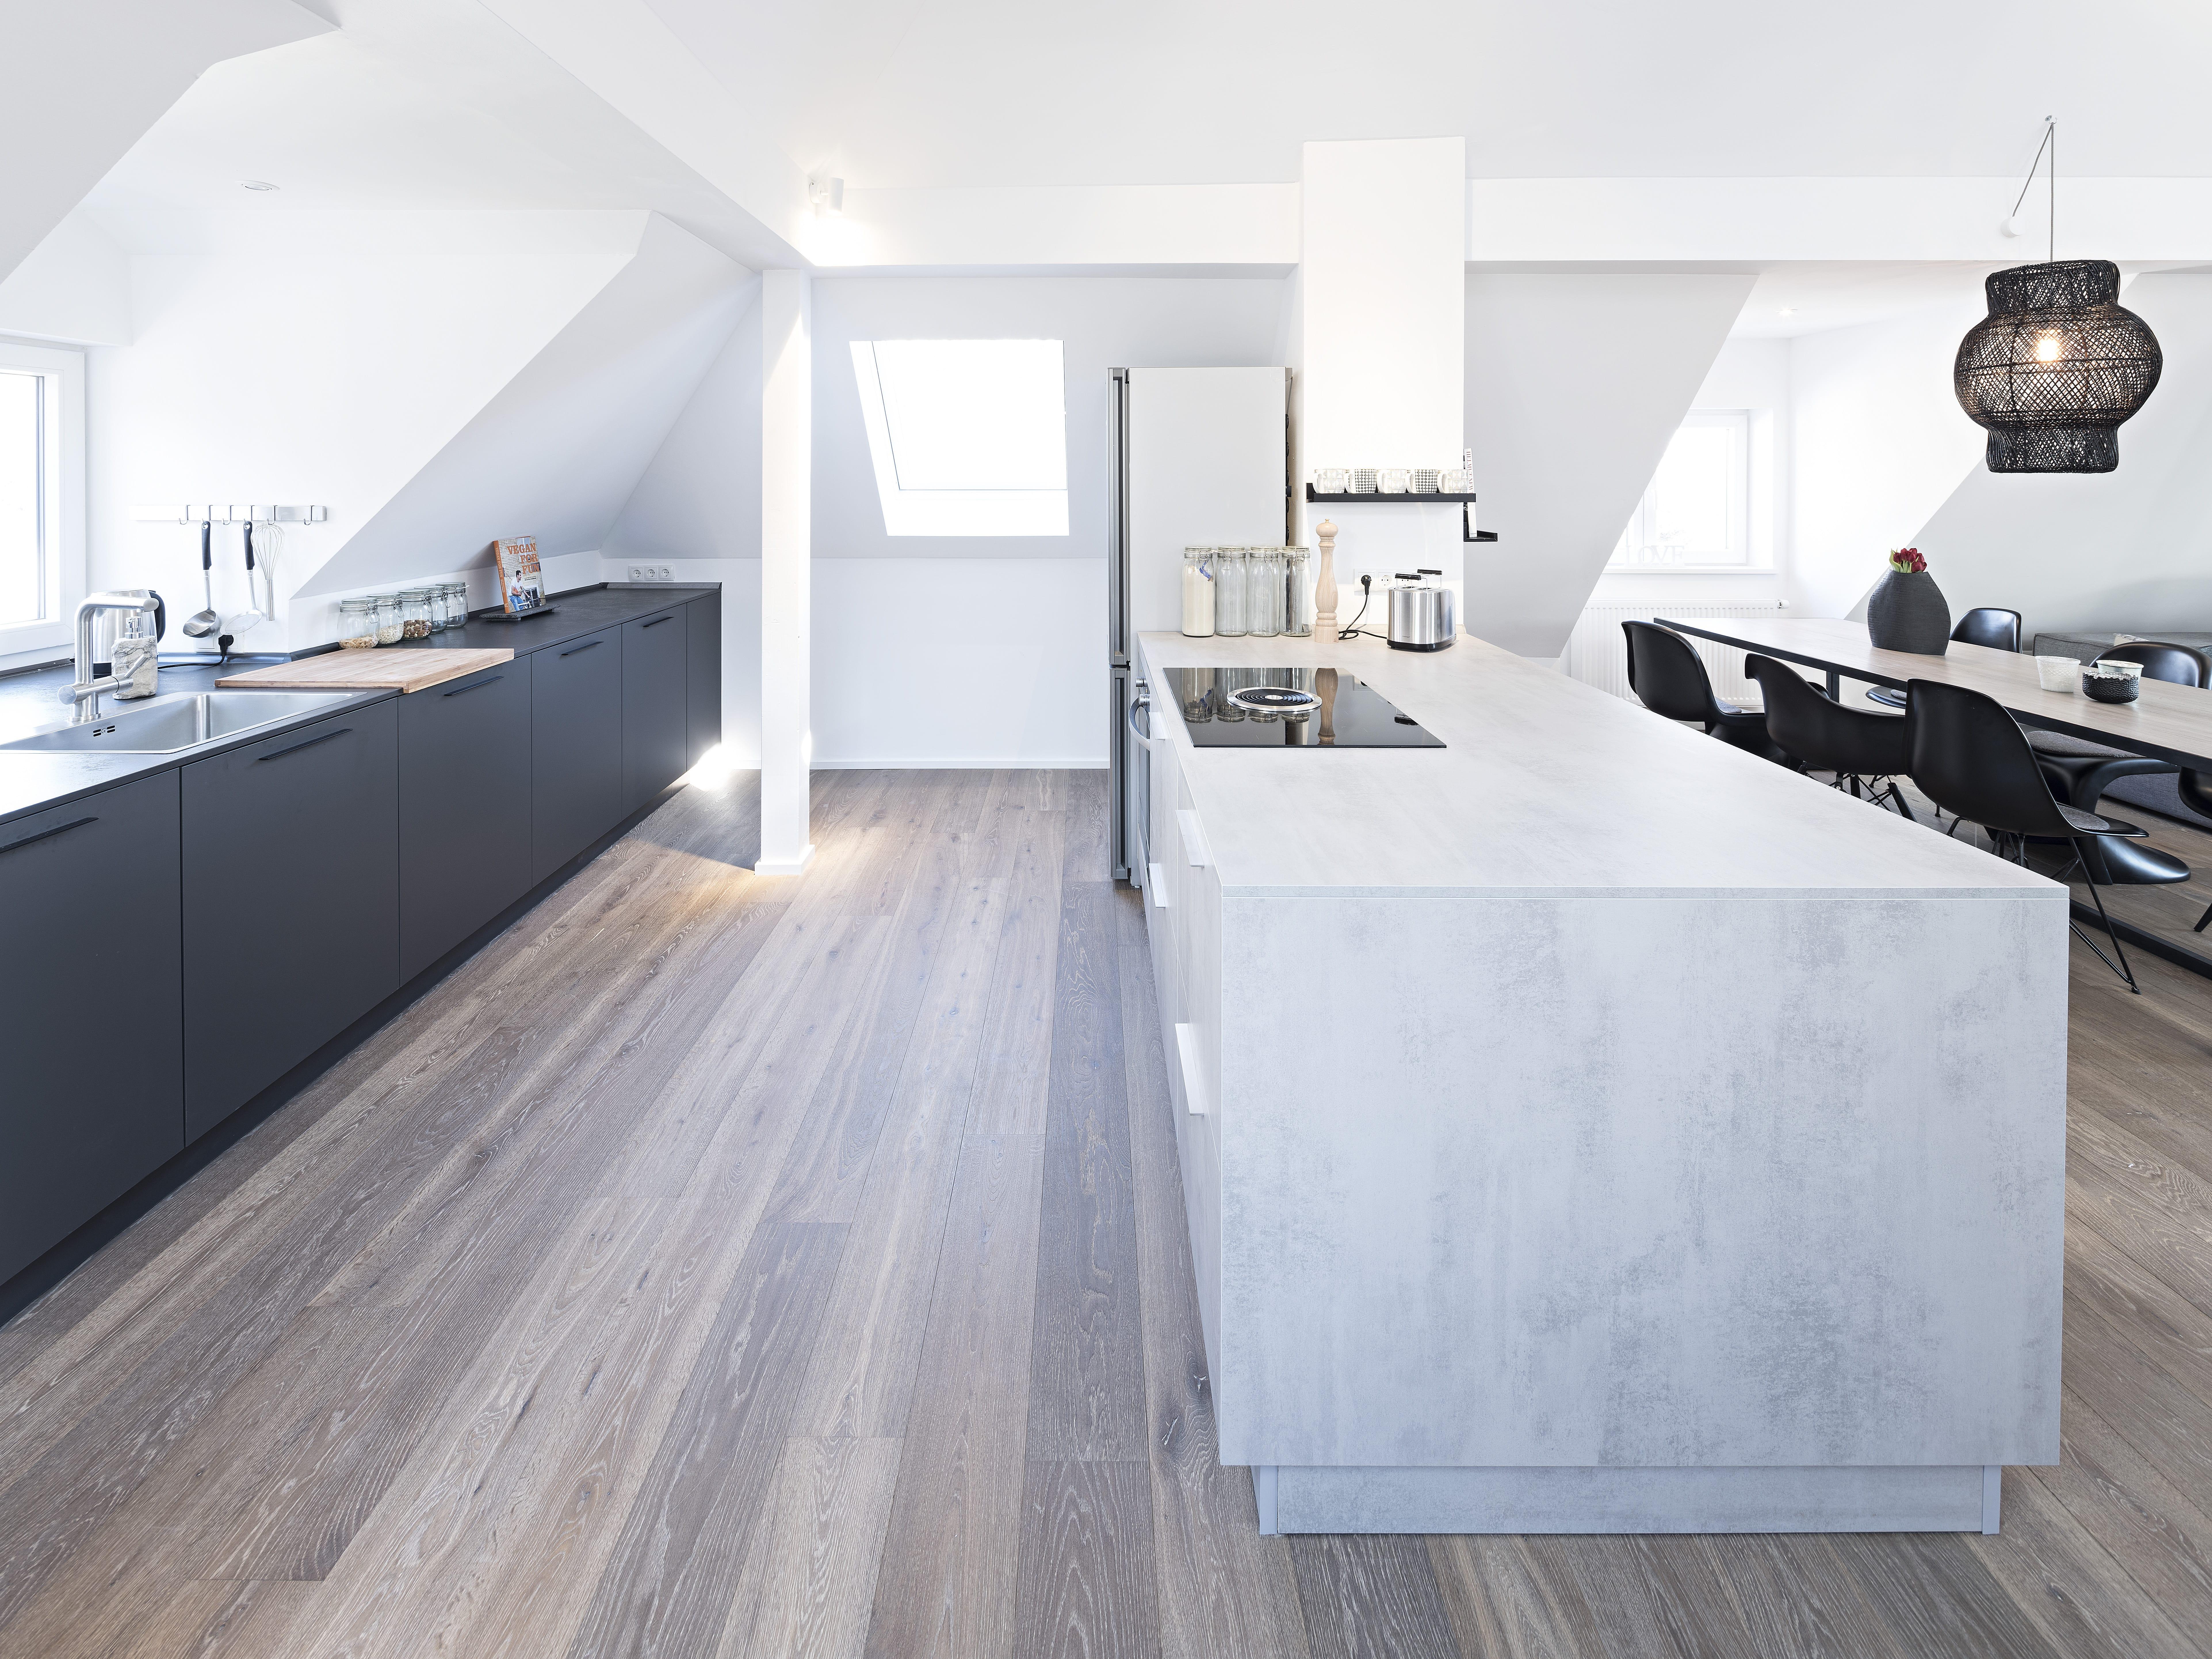 Kitchen changes and renovation, Tina Kirschner